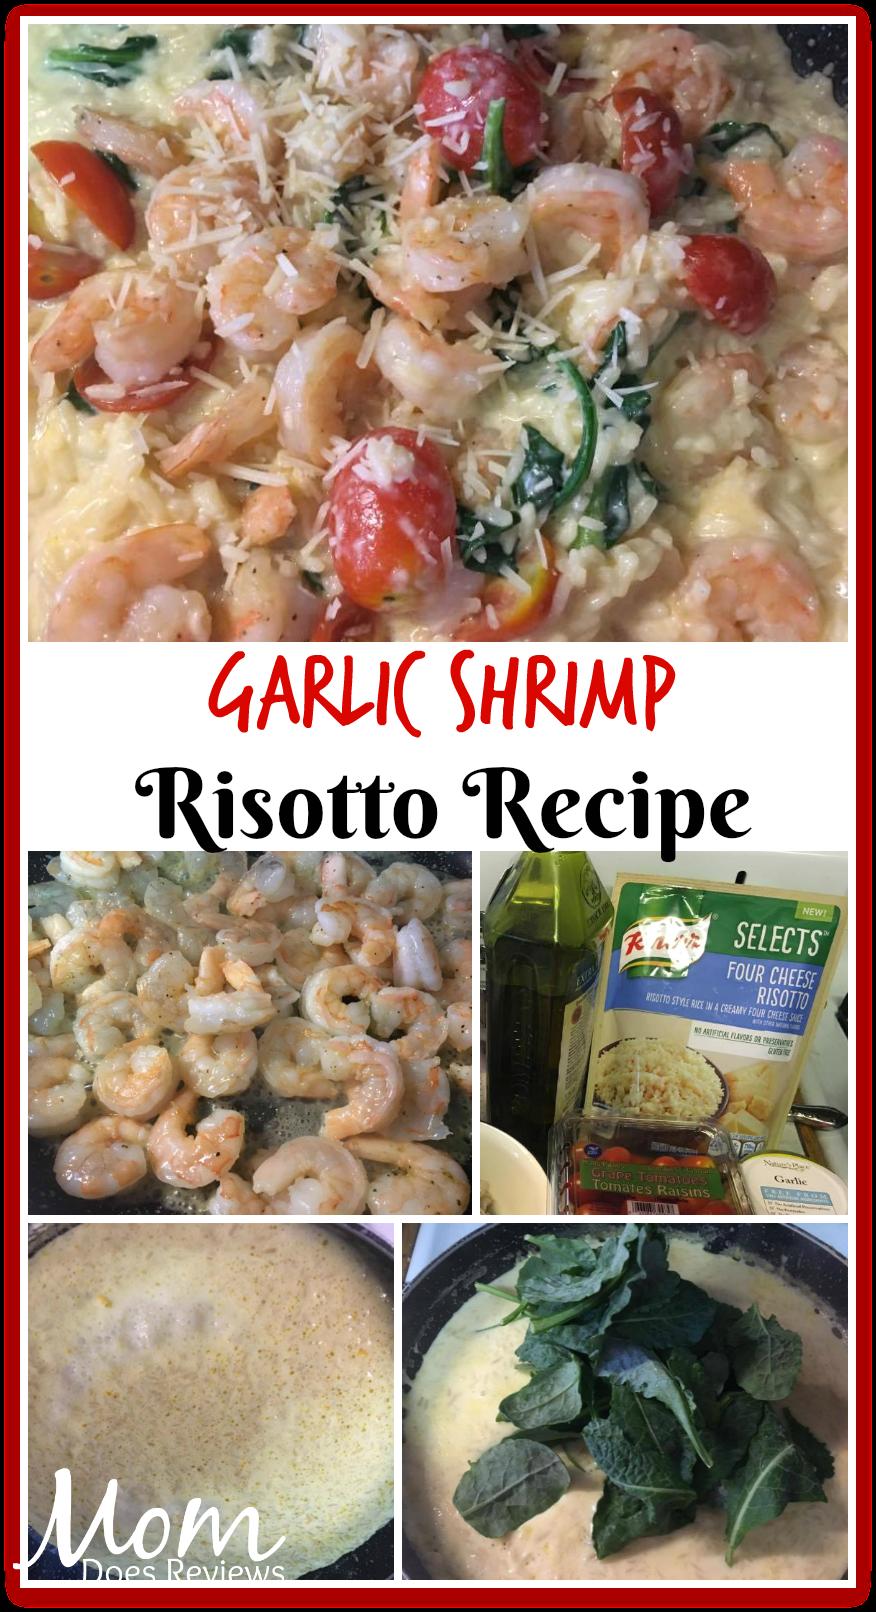 Garlic Shrimp Risotta Recipe